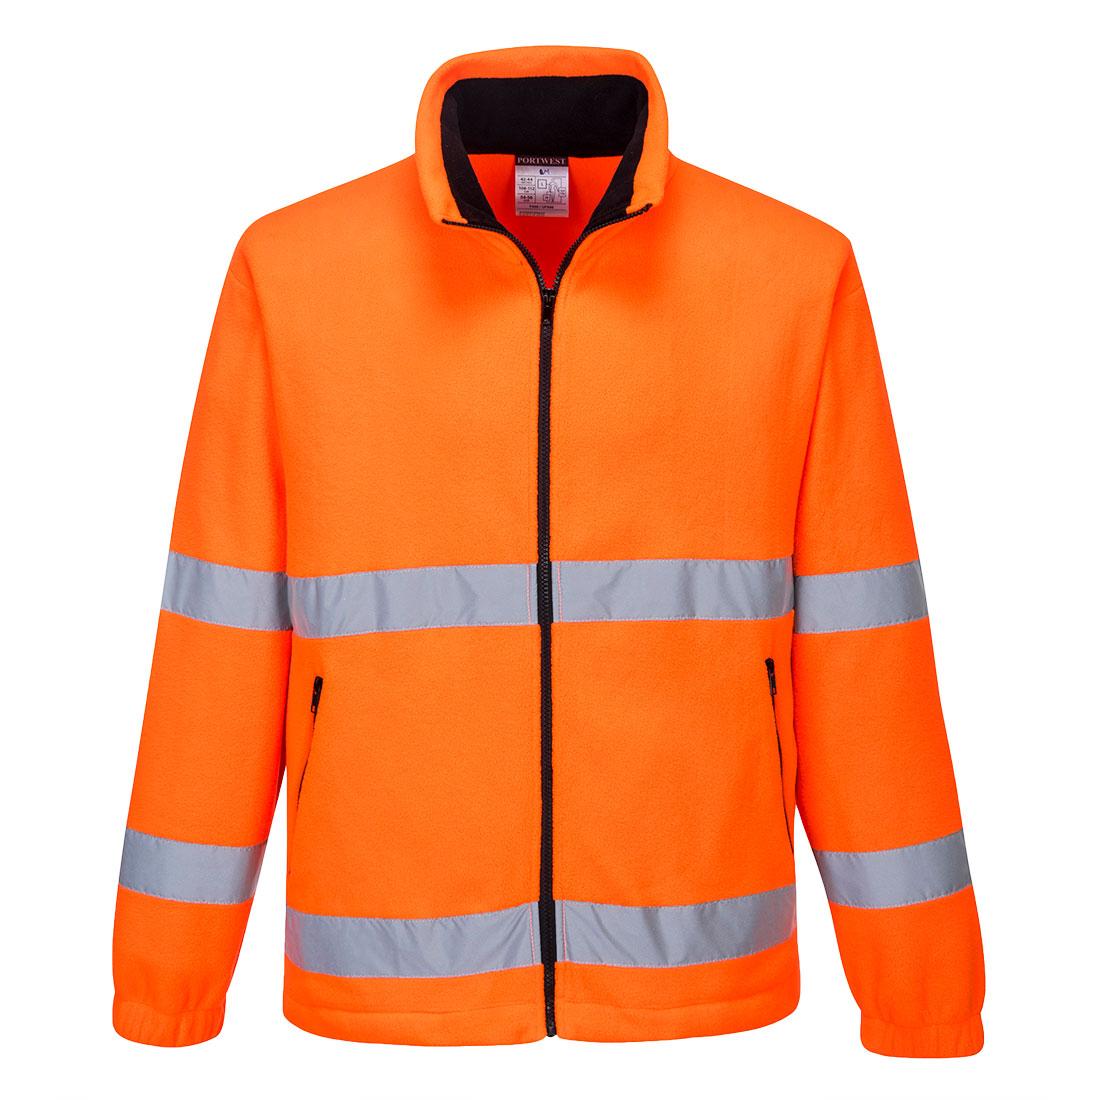 Portwest Hi-Vis Essential Fleece (Oranje) S